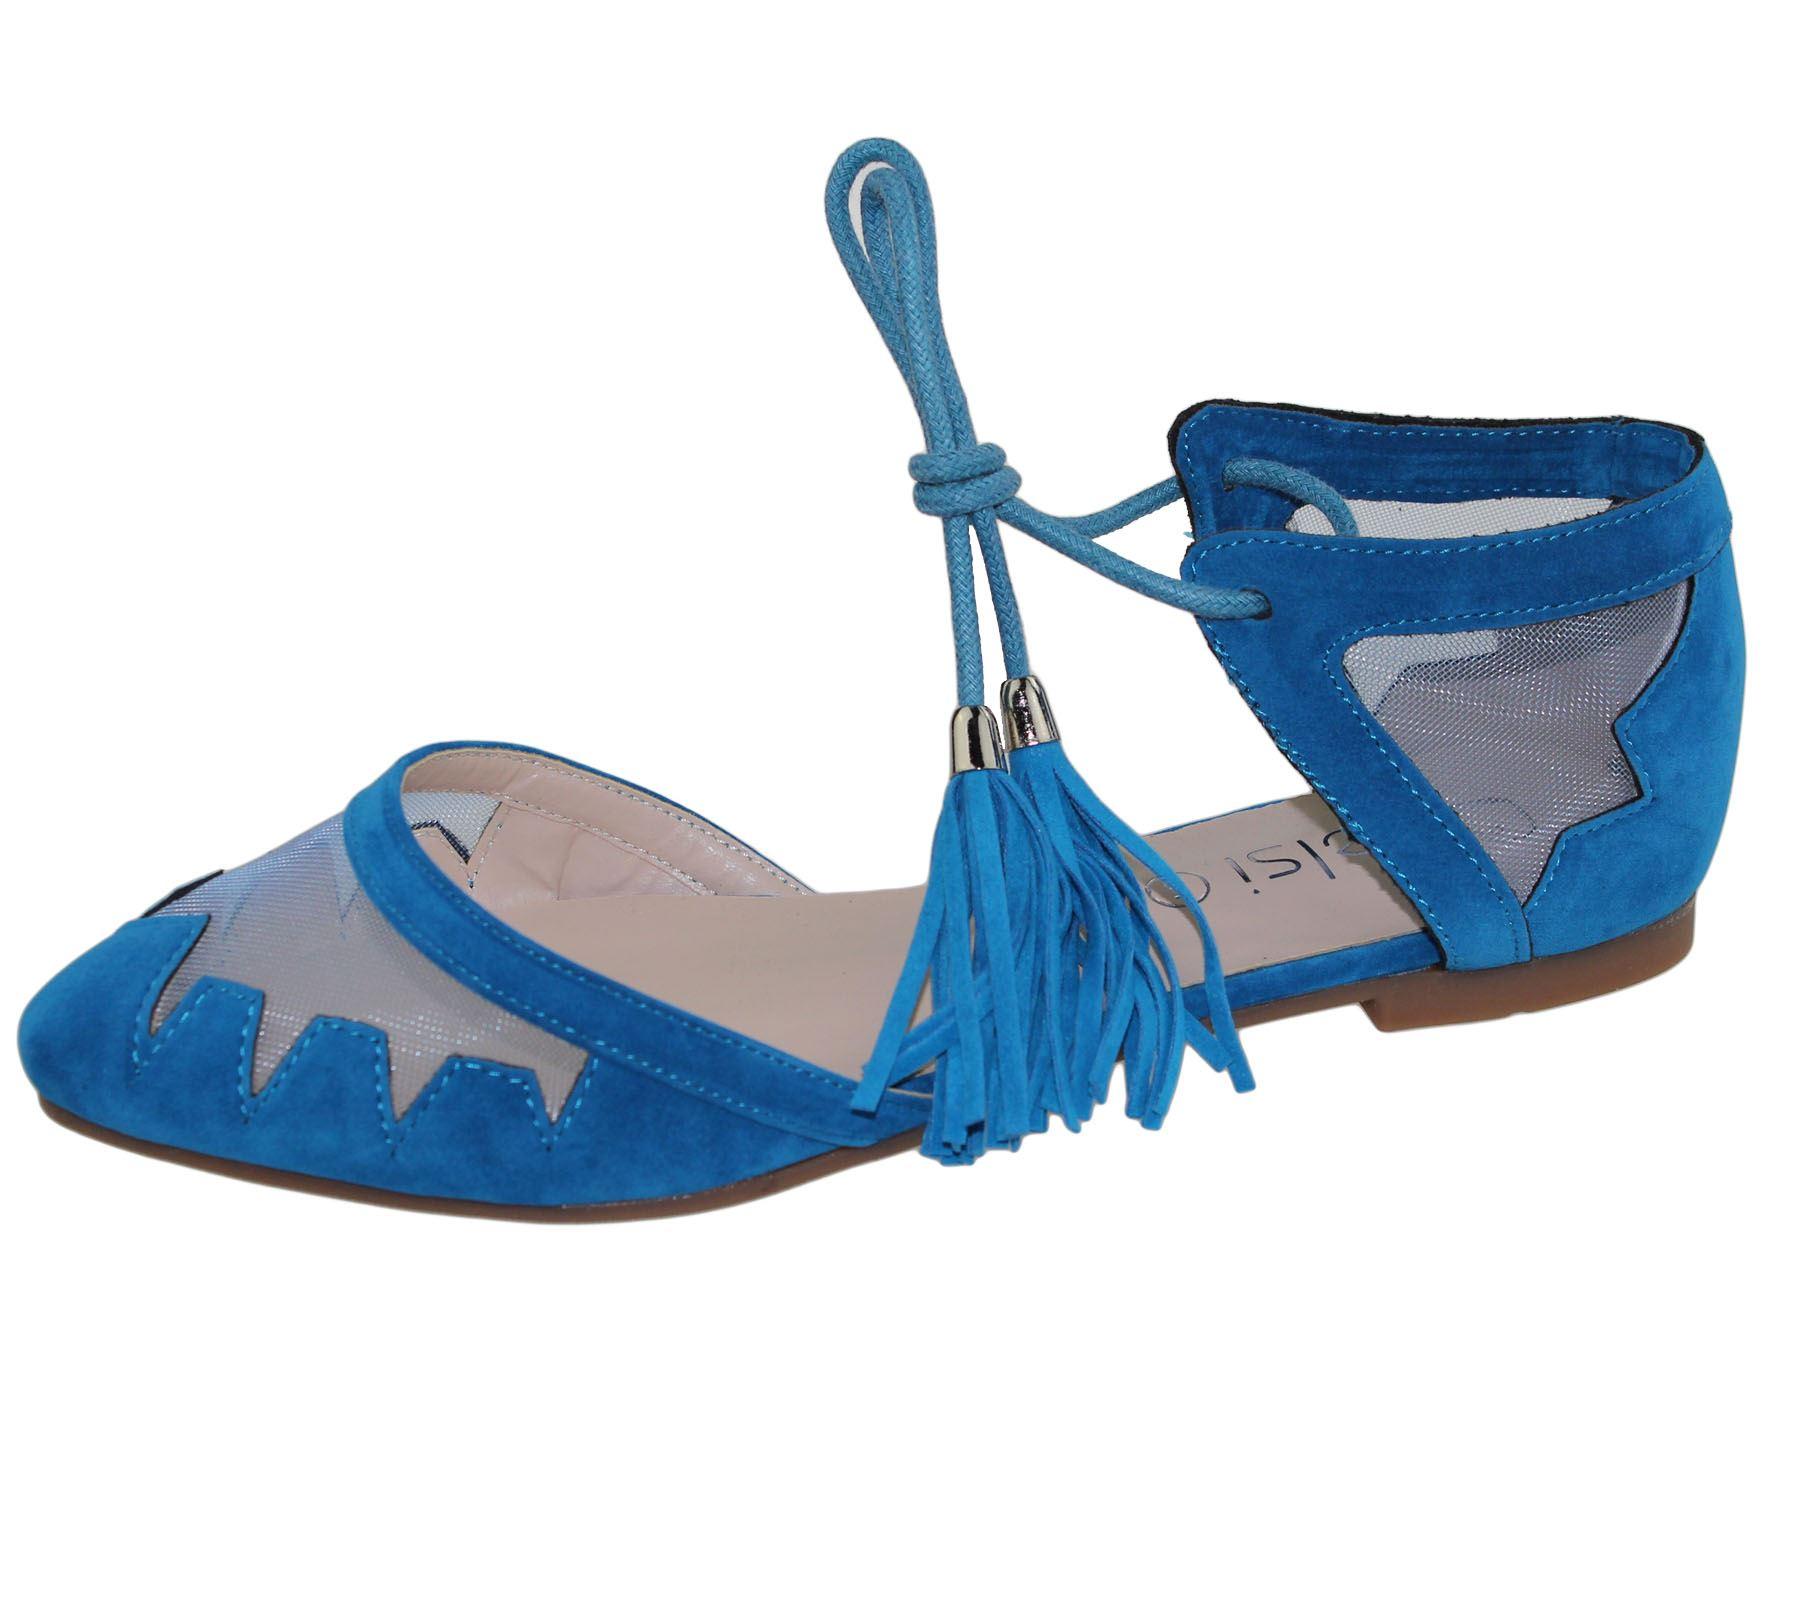 Womens-Flat-Ballerina-Dolly-Pumps-Ballet-Ladies-Summer-Mesh-Tassel-Shoes-Sandals thumbnail 3